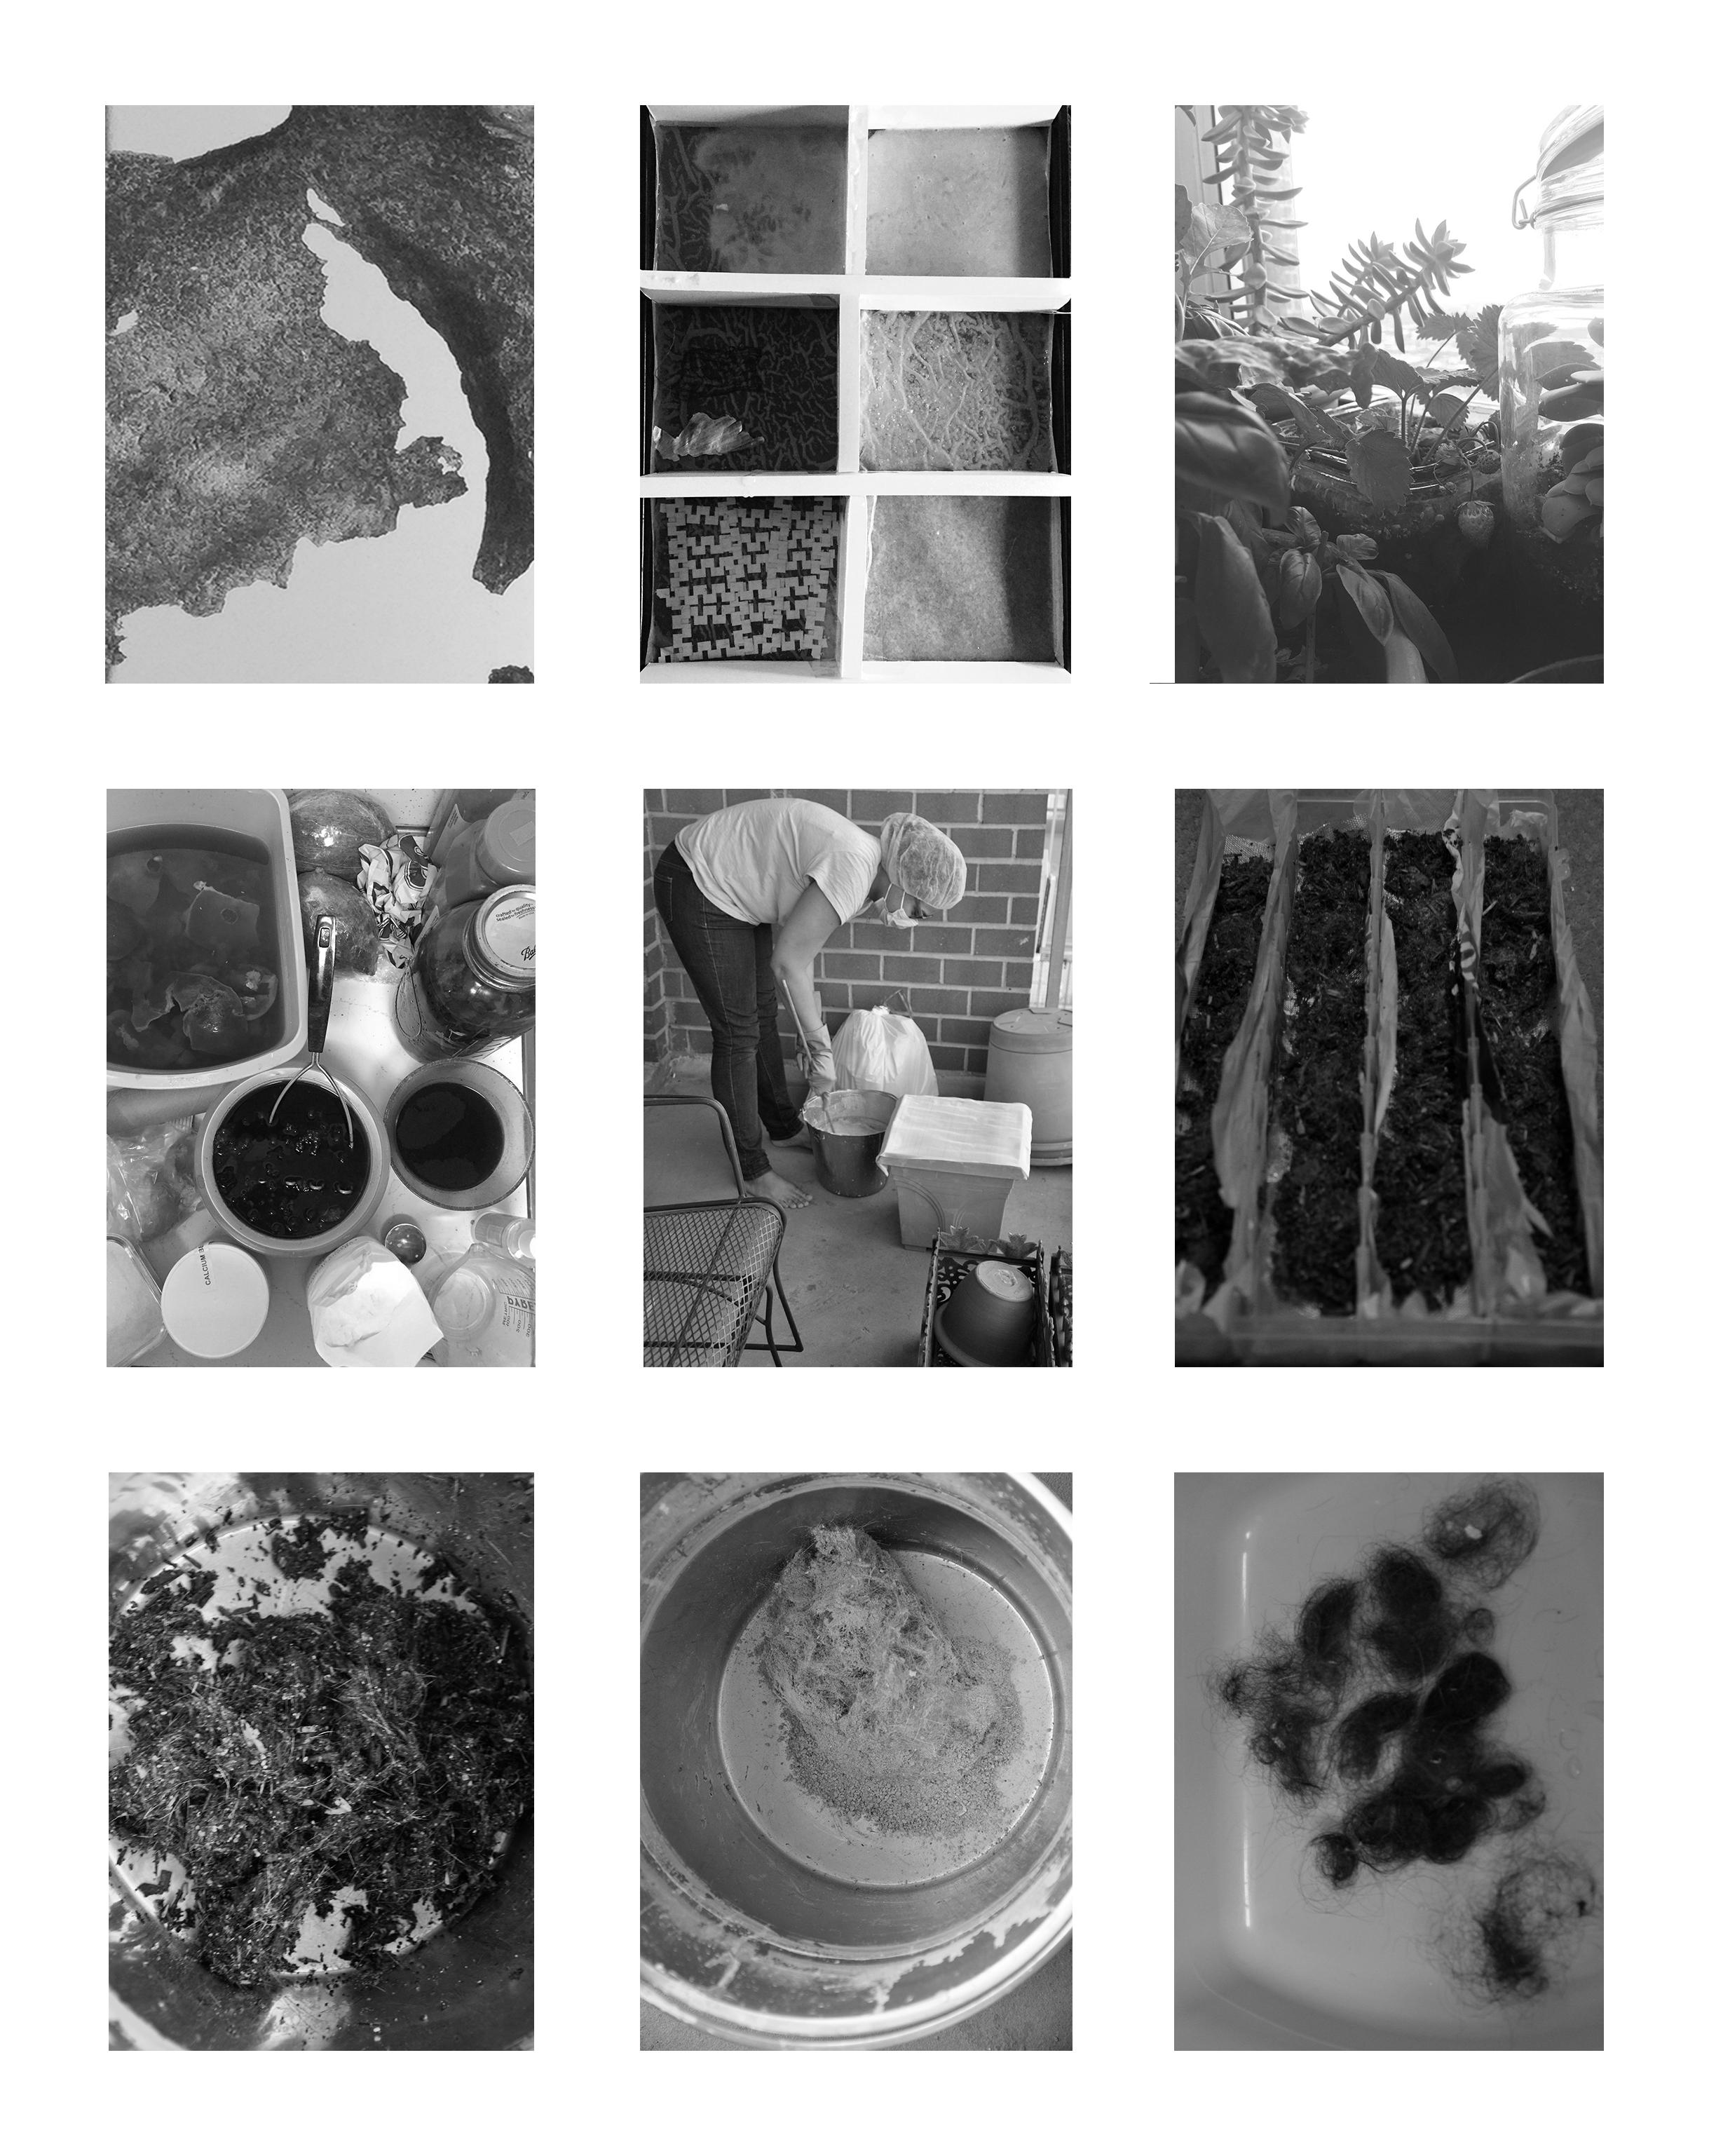 bioplastic cover.jpg